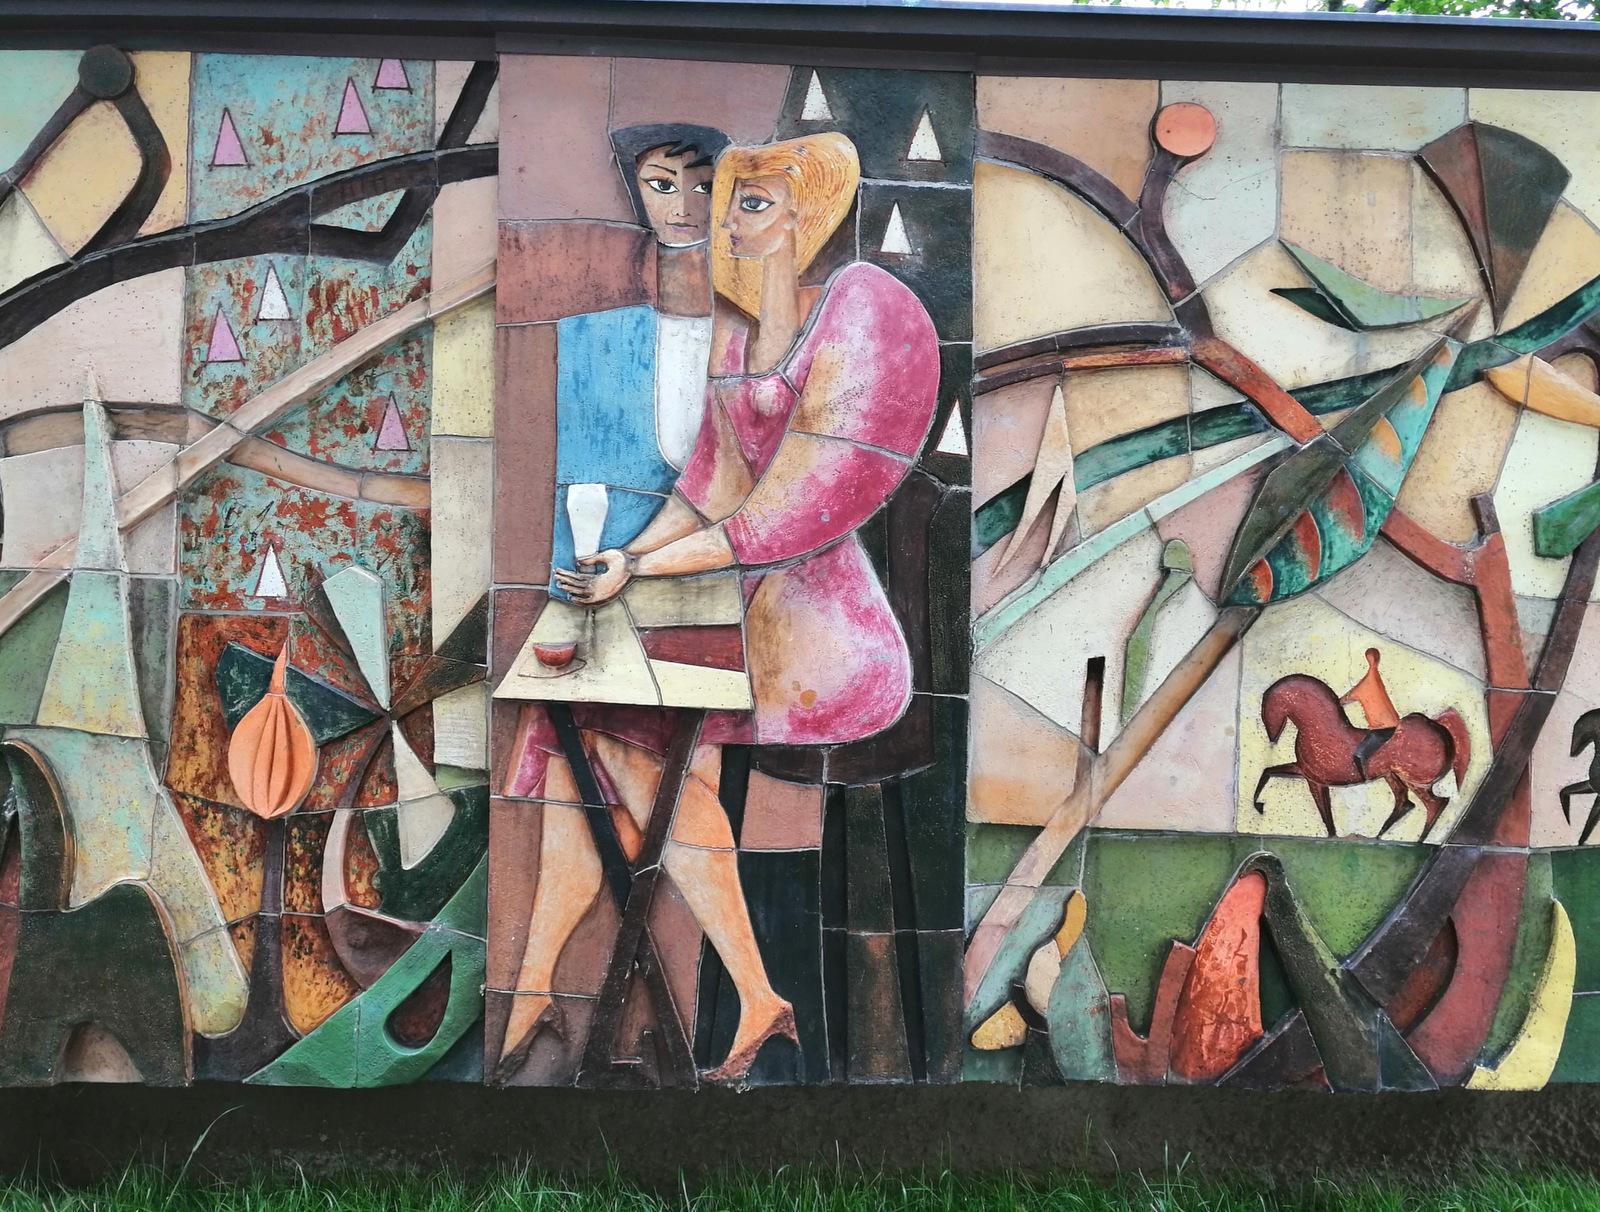 Umetnina v parku